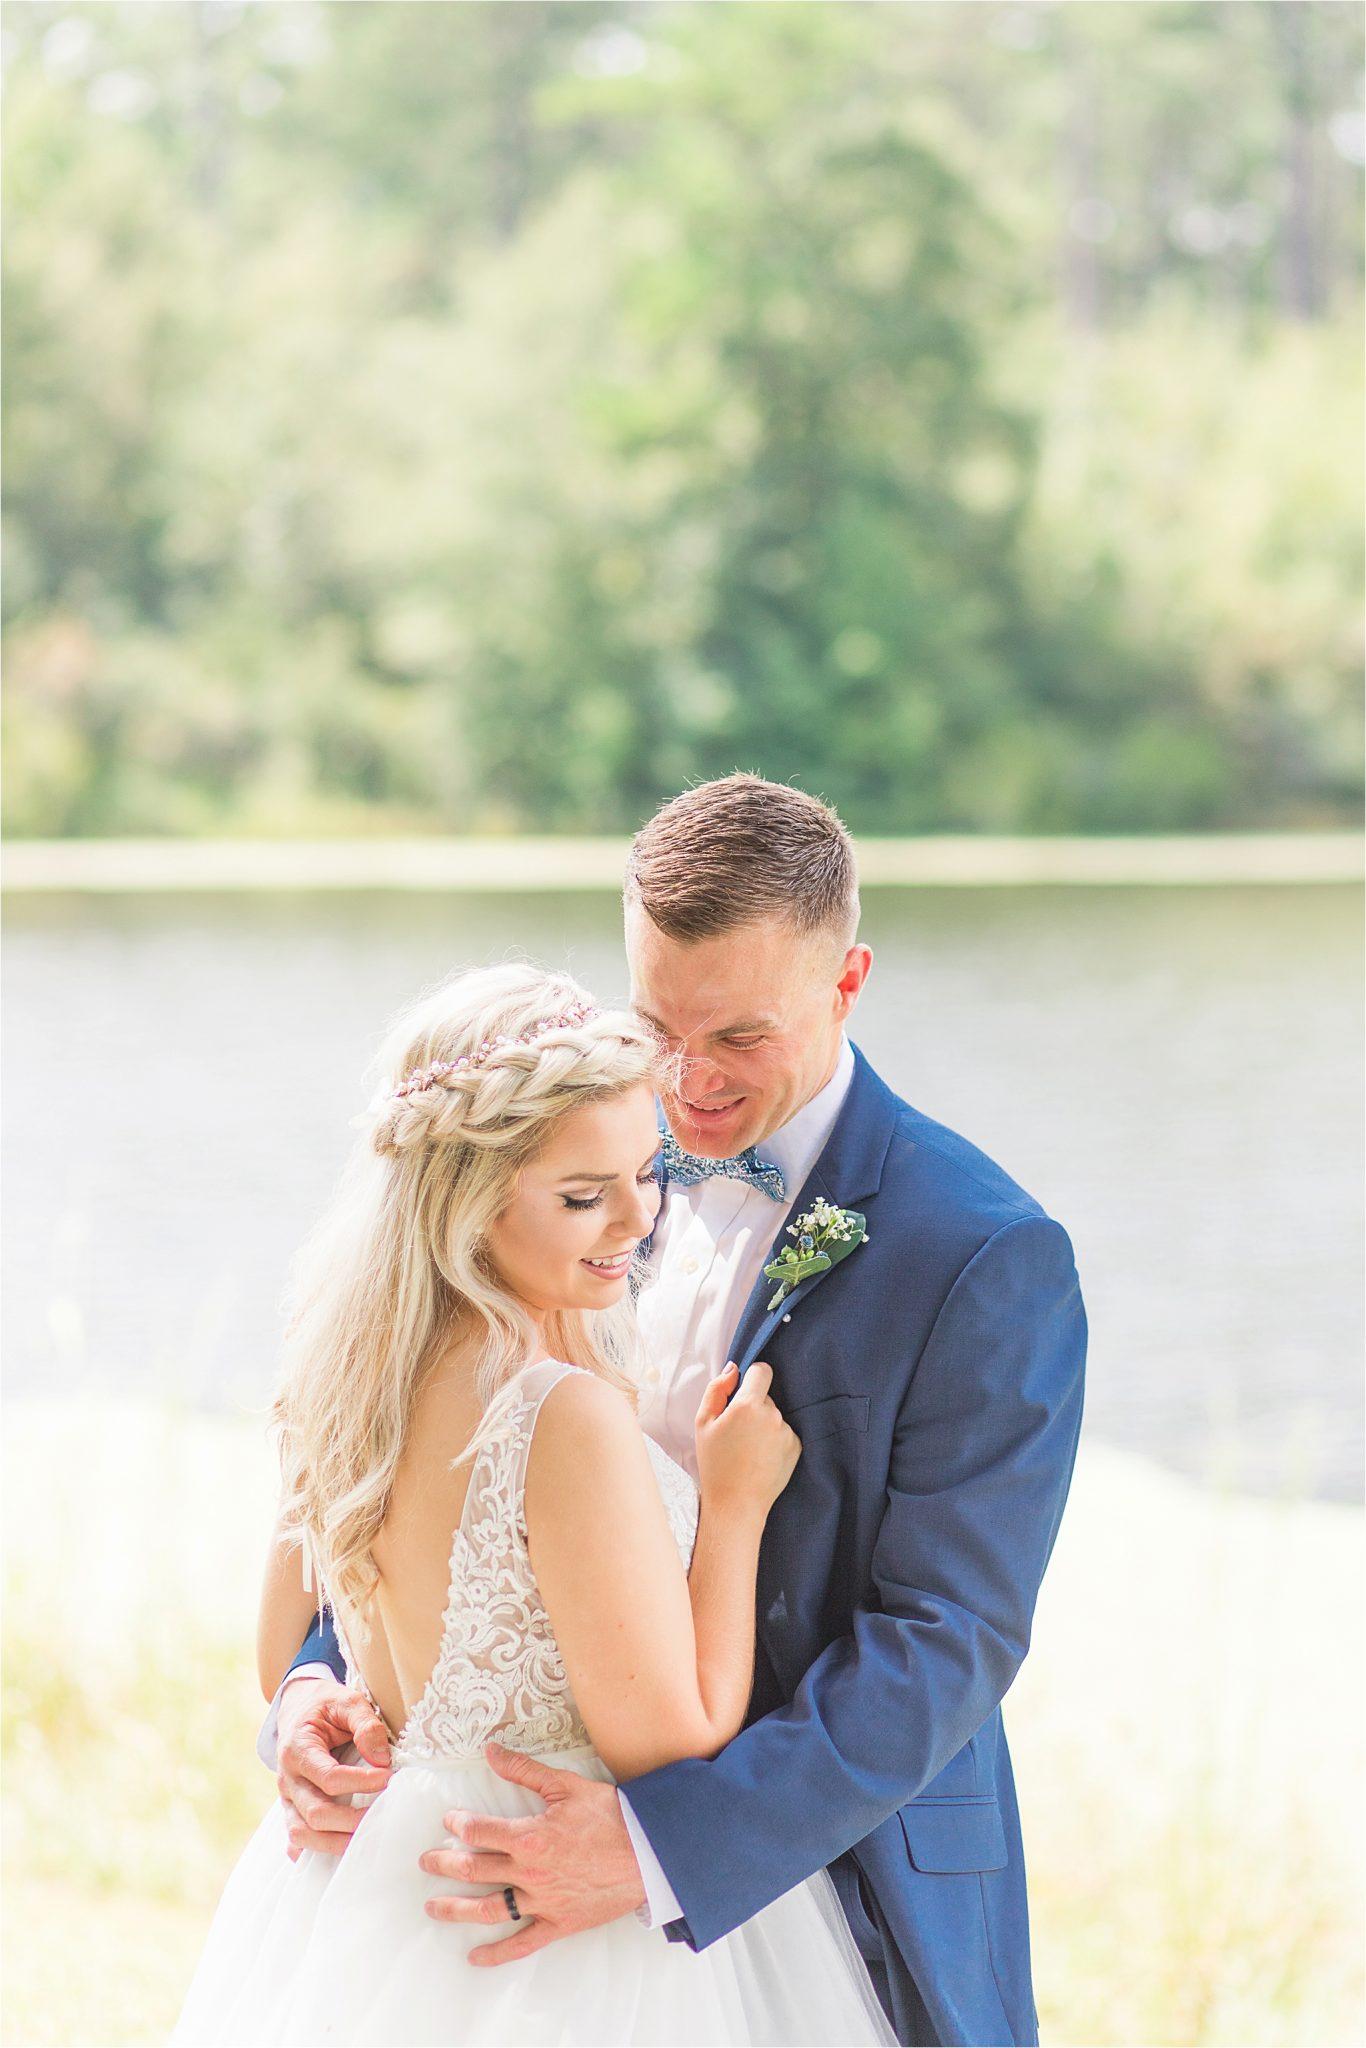 bridal-groom-portraits-photos-blue-suit-bow-tie-first-look-photo-ideas